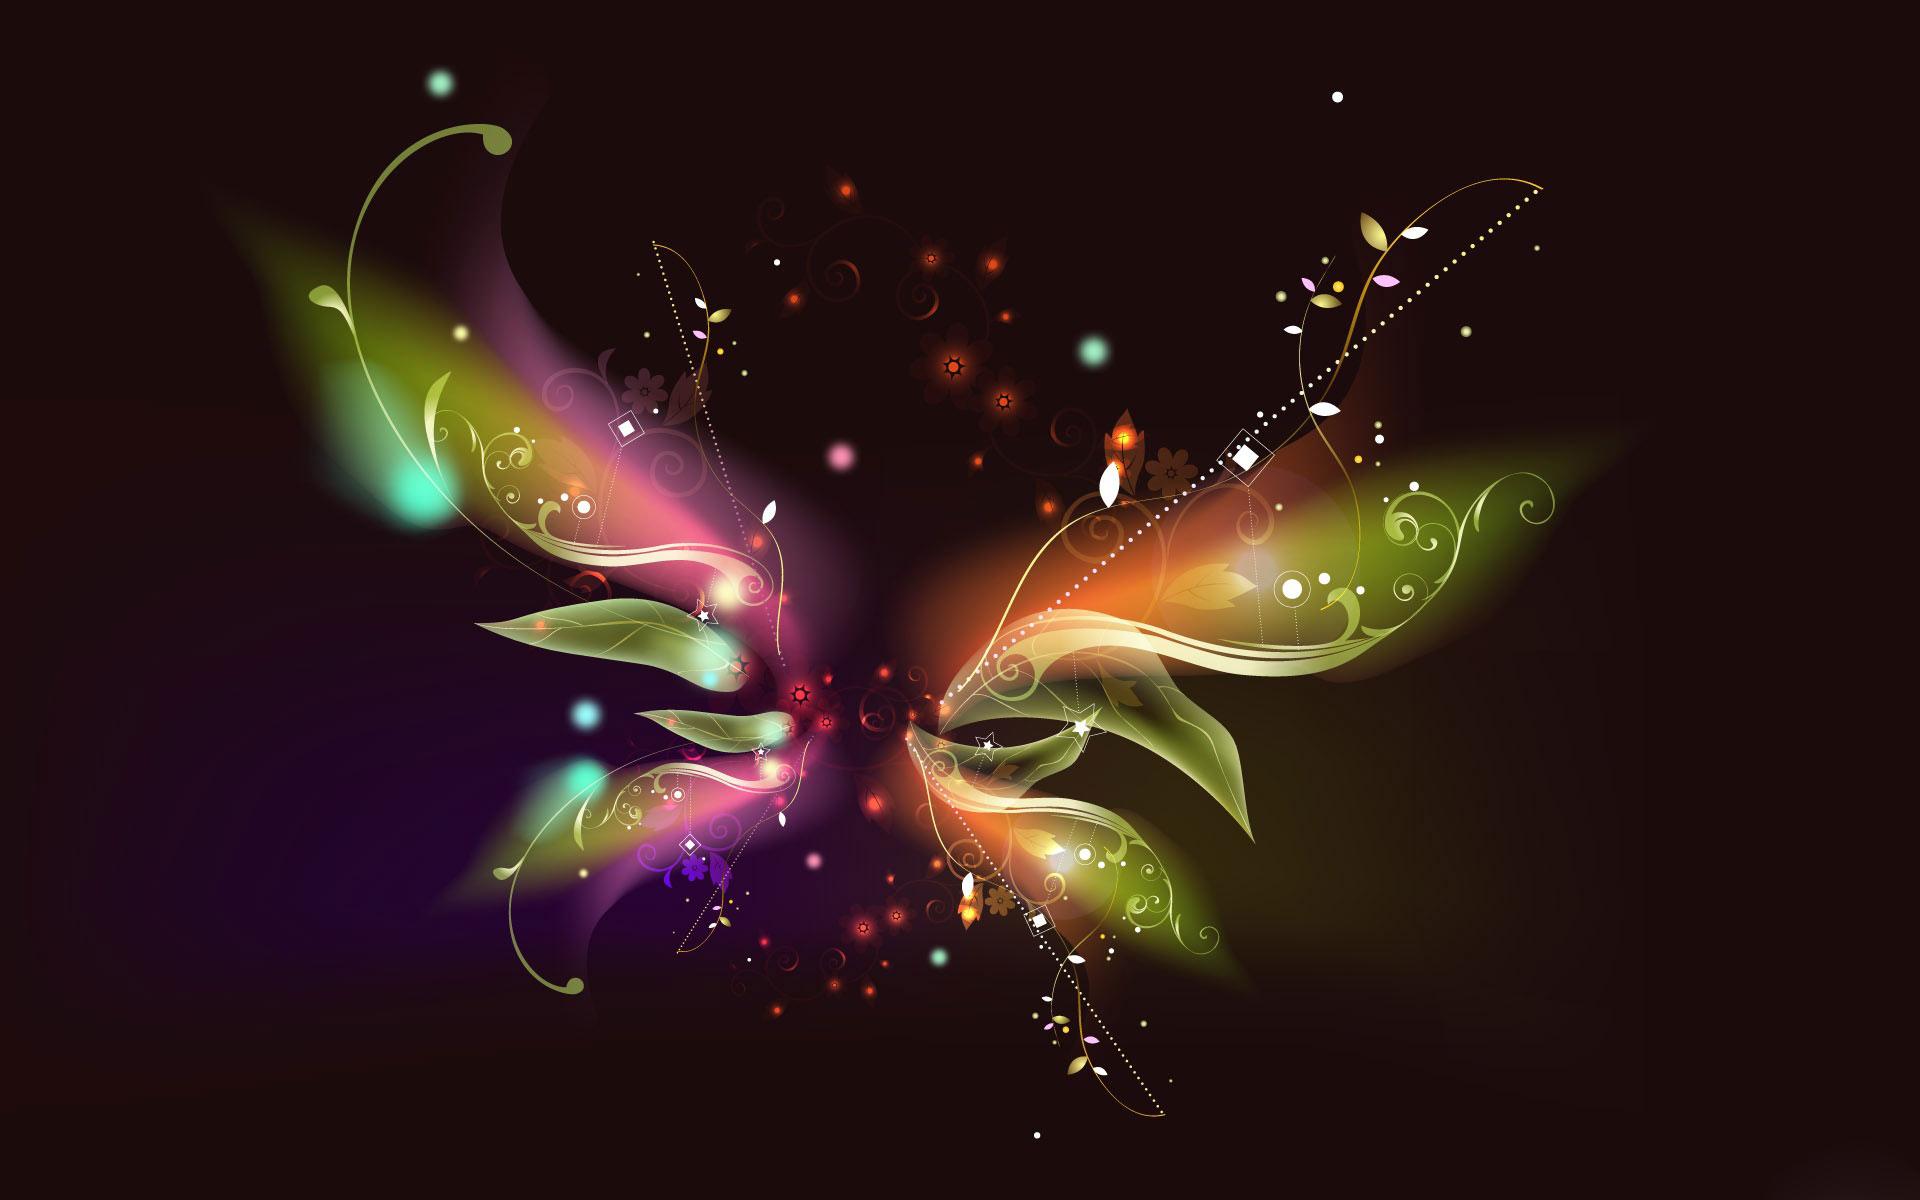 butterflies live wallpaper free download aa